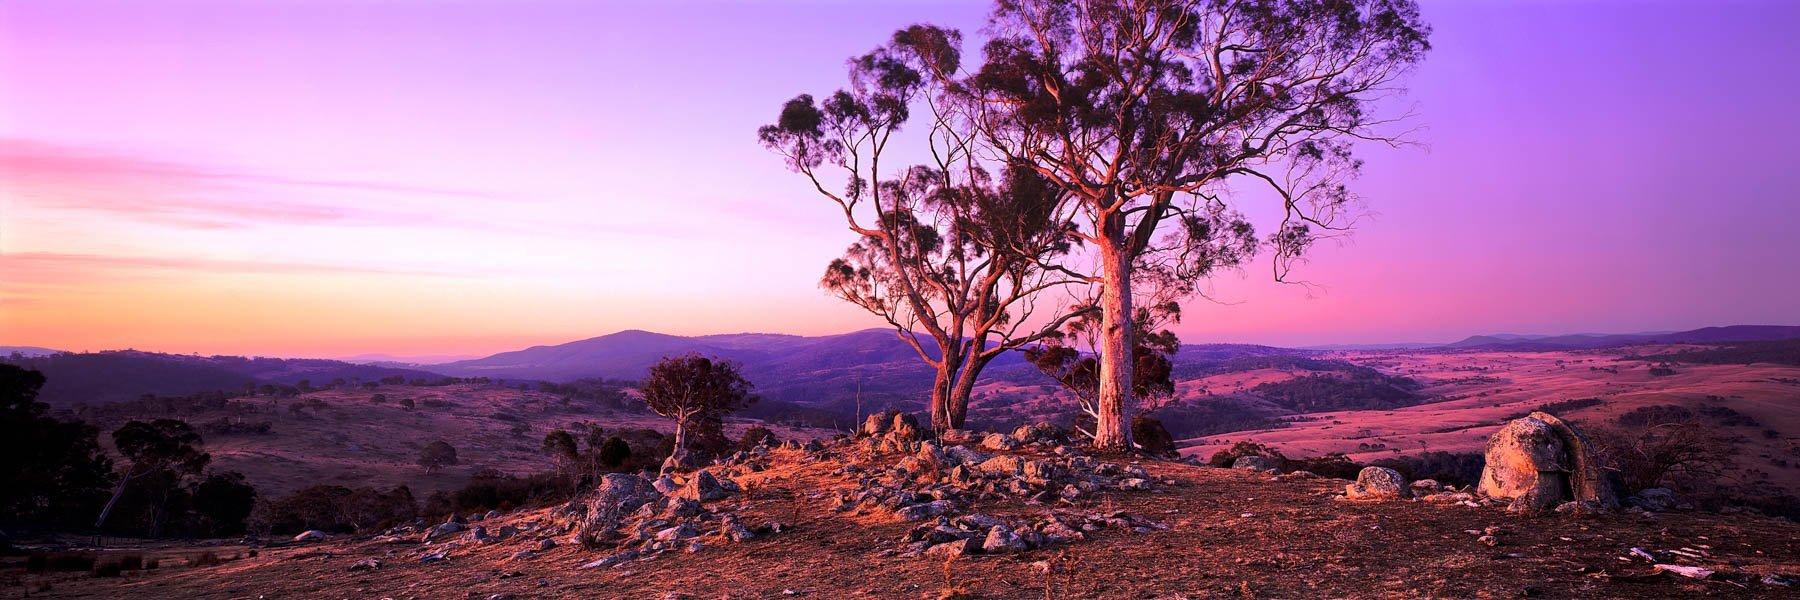 Pastel sunset over a farm, Queenbeyan, NSW, Australia.